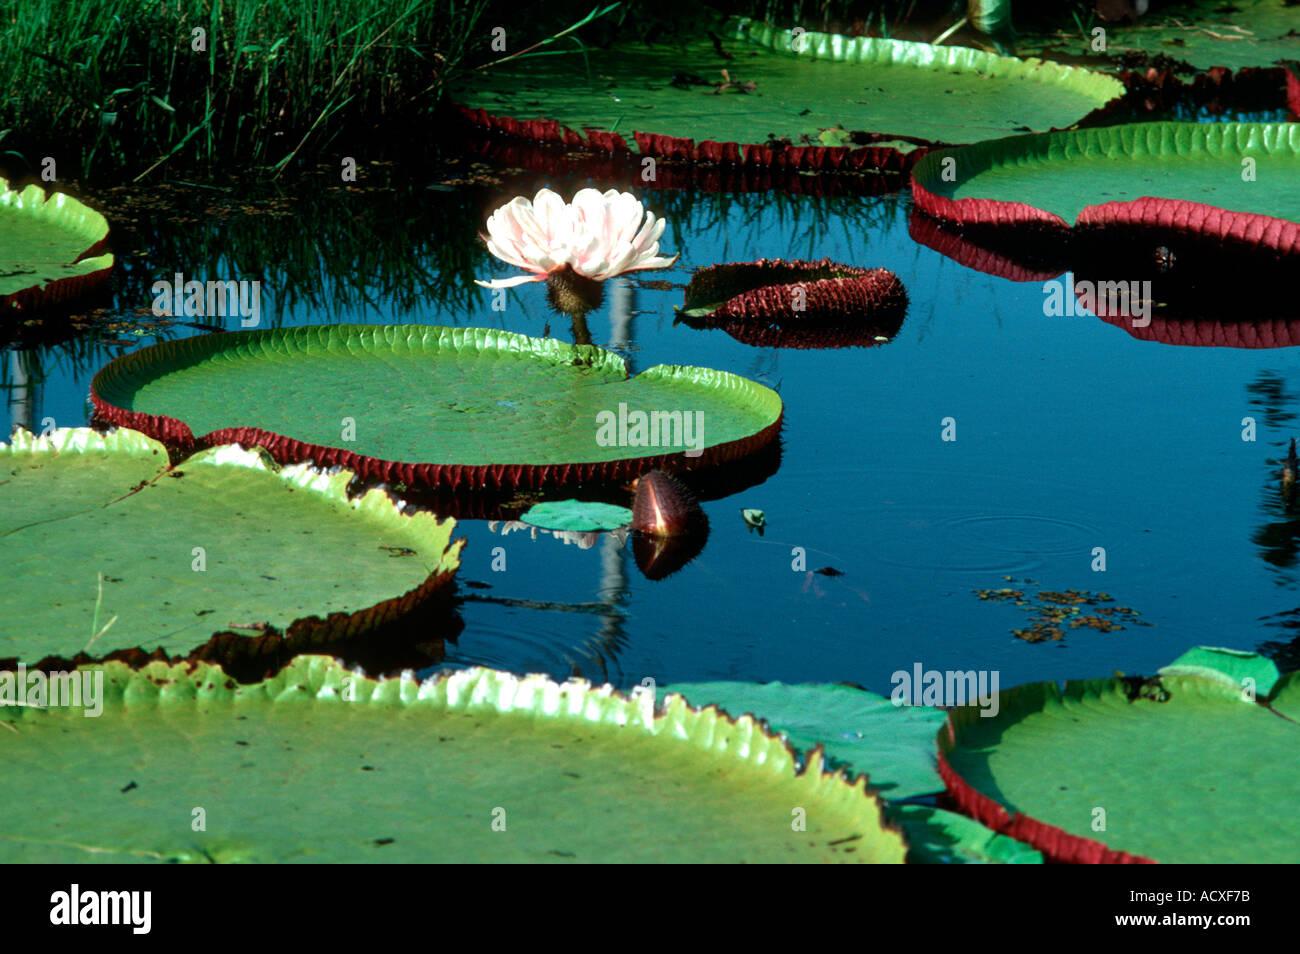 giant-water-lilly-vitoria-regia-victoria